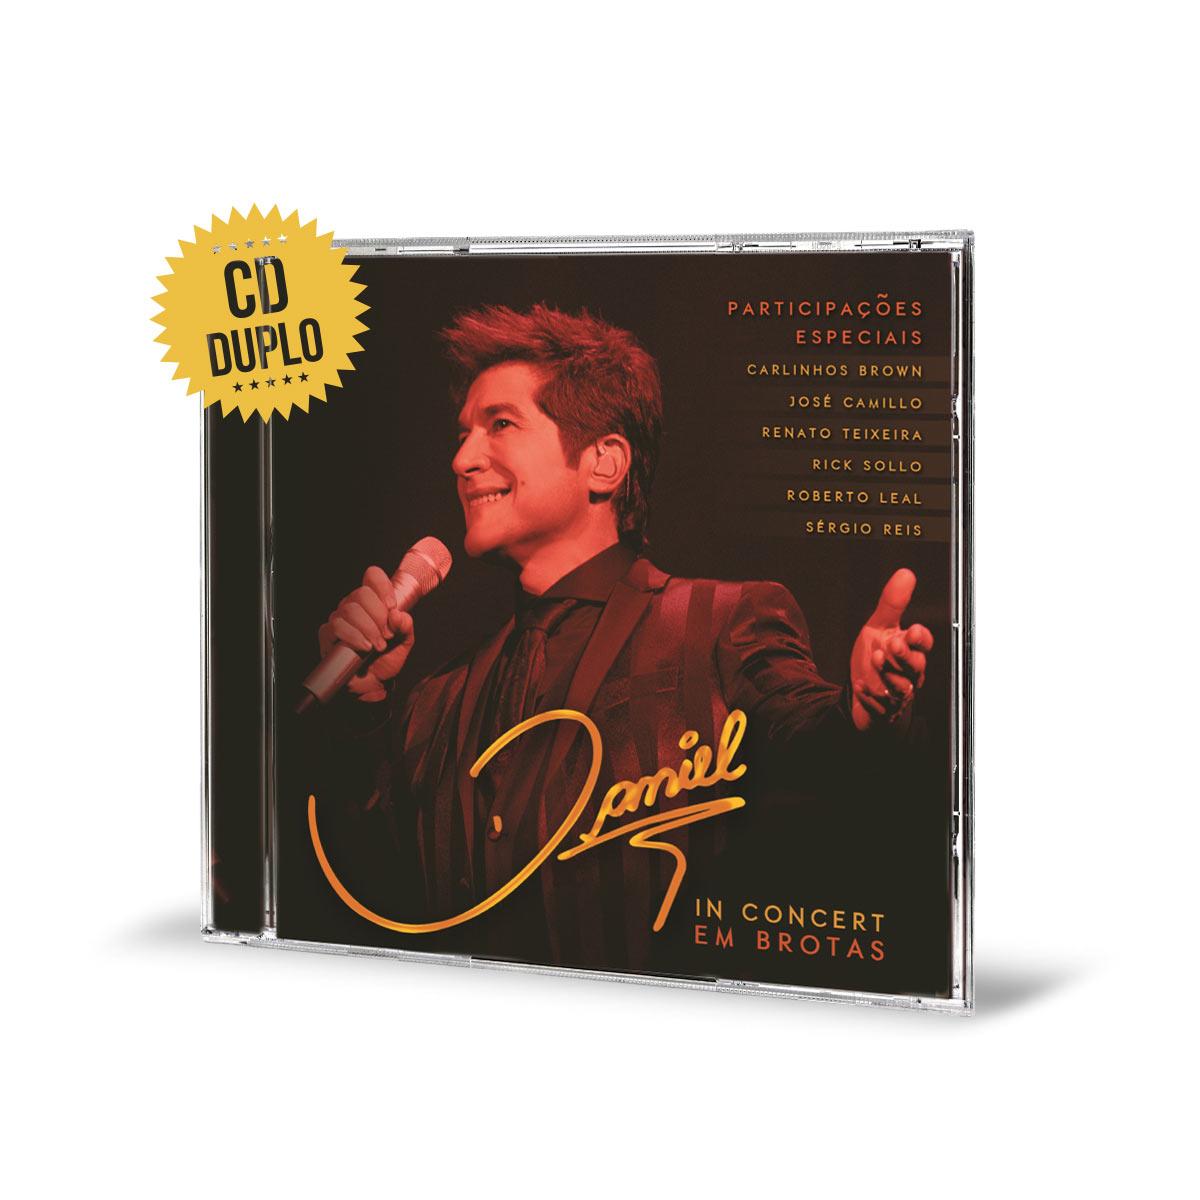 CD Duplo Daniel In Concert Em Brotas